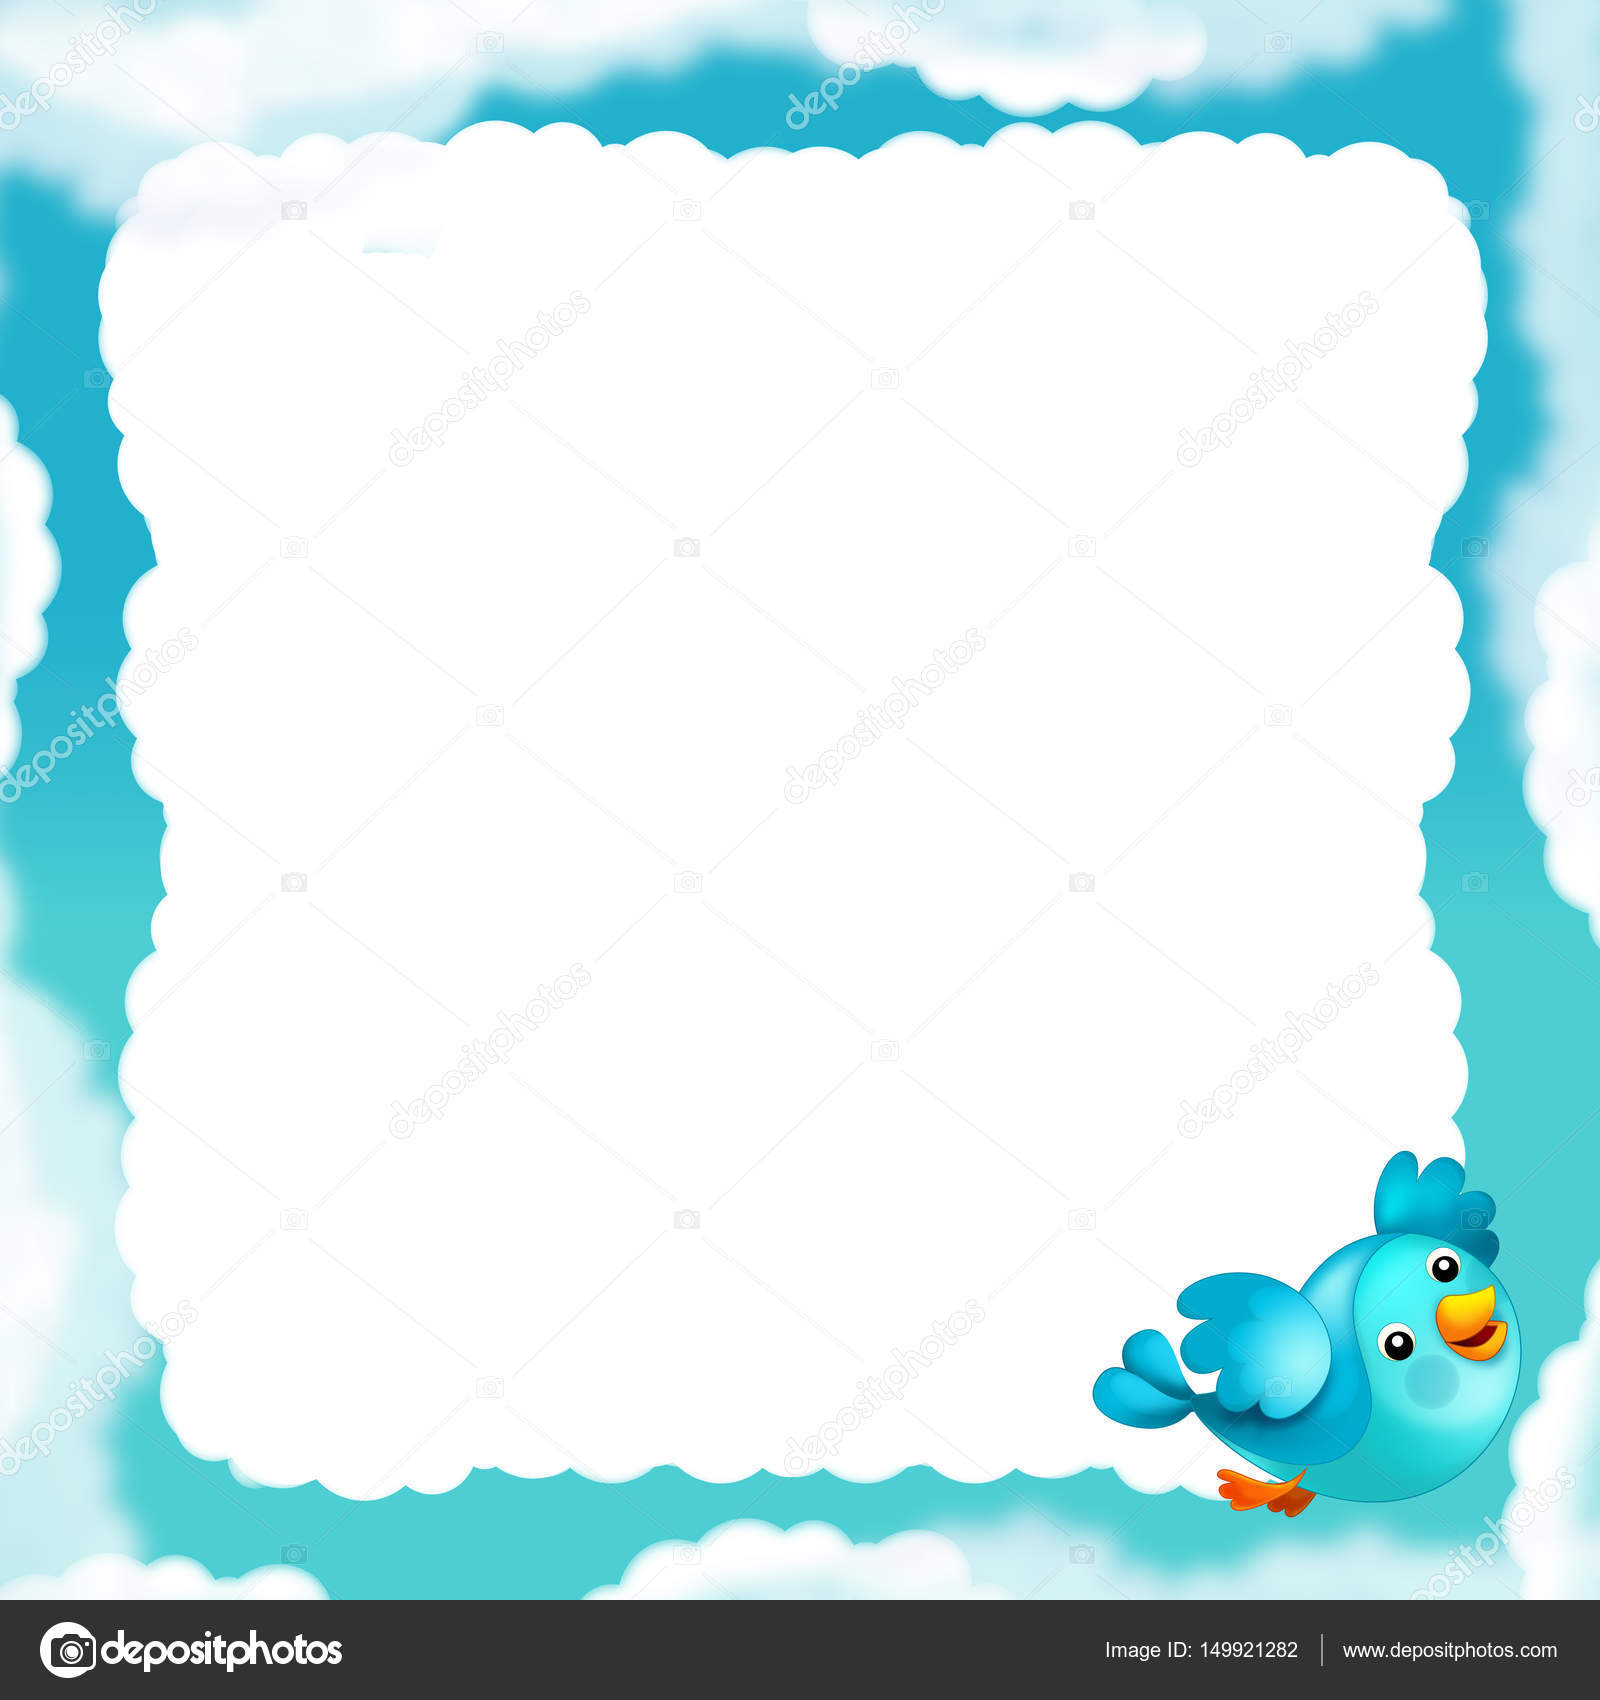 cartoon cloud frame — Stock Photo © agaes8080 #149921282